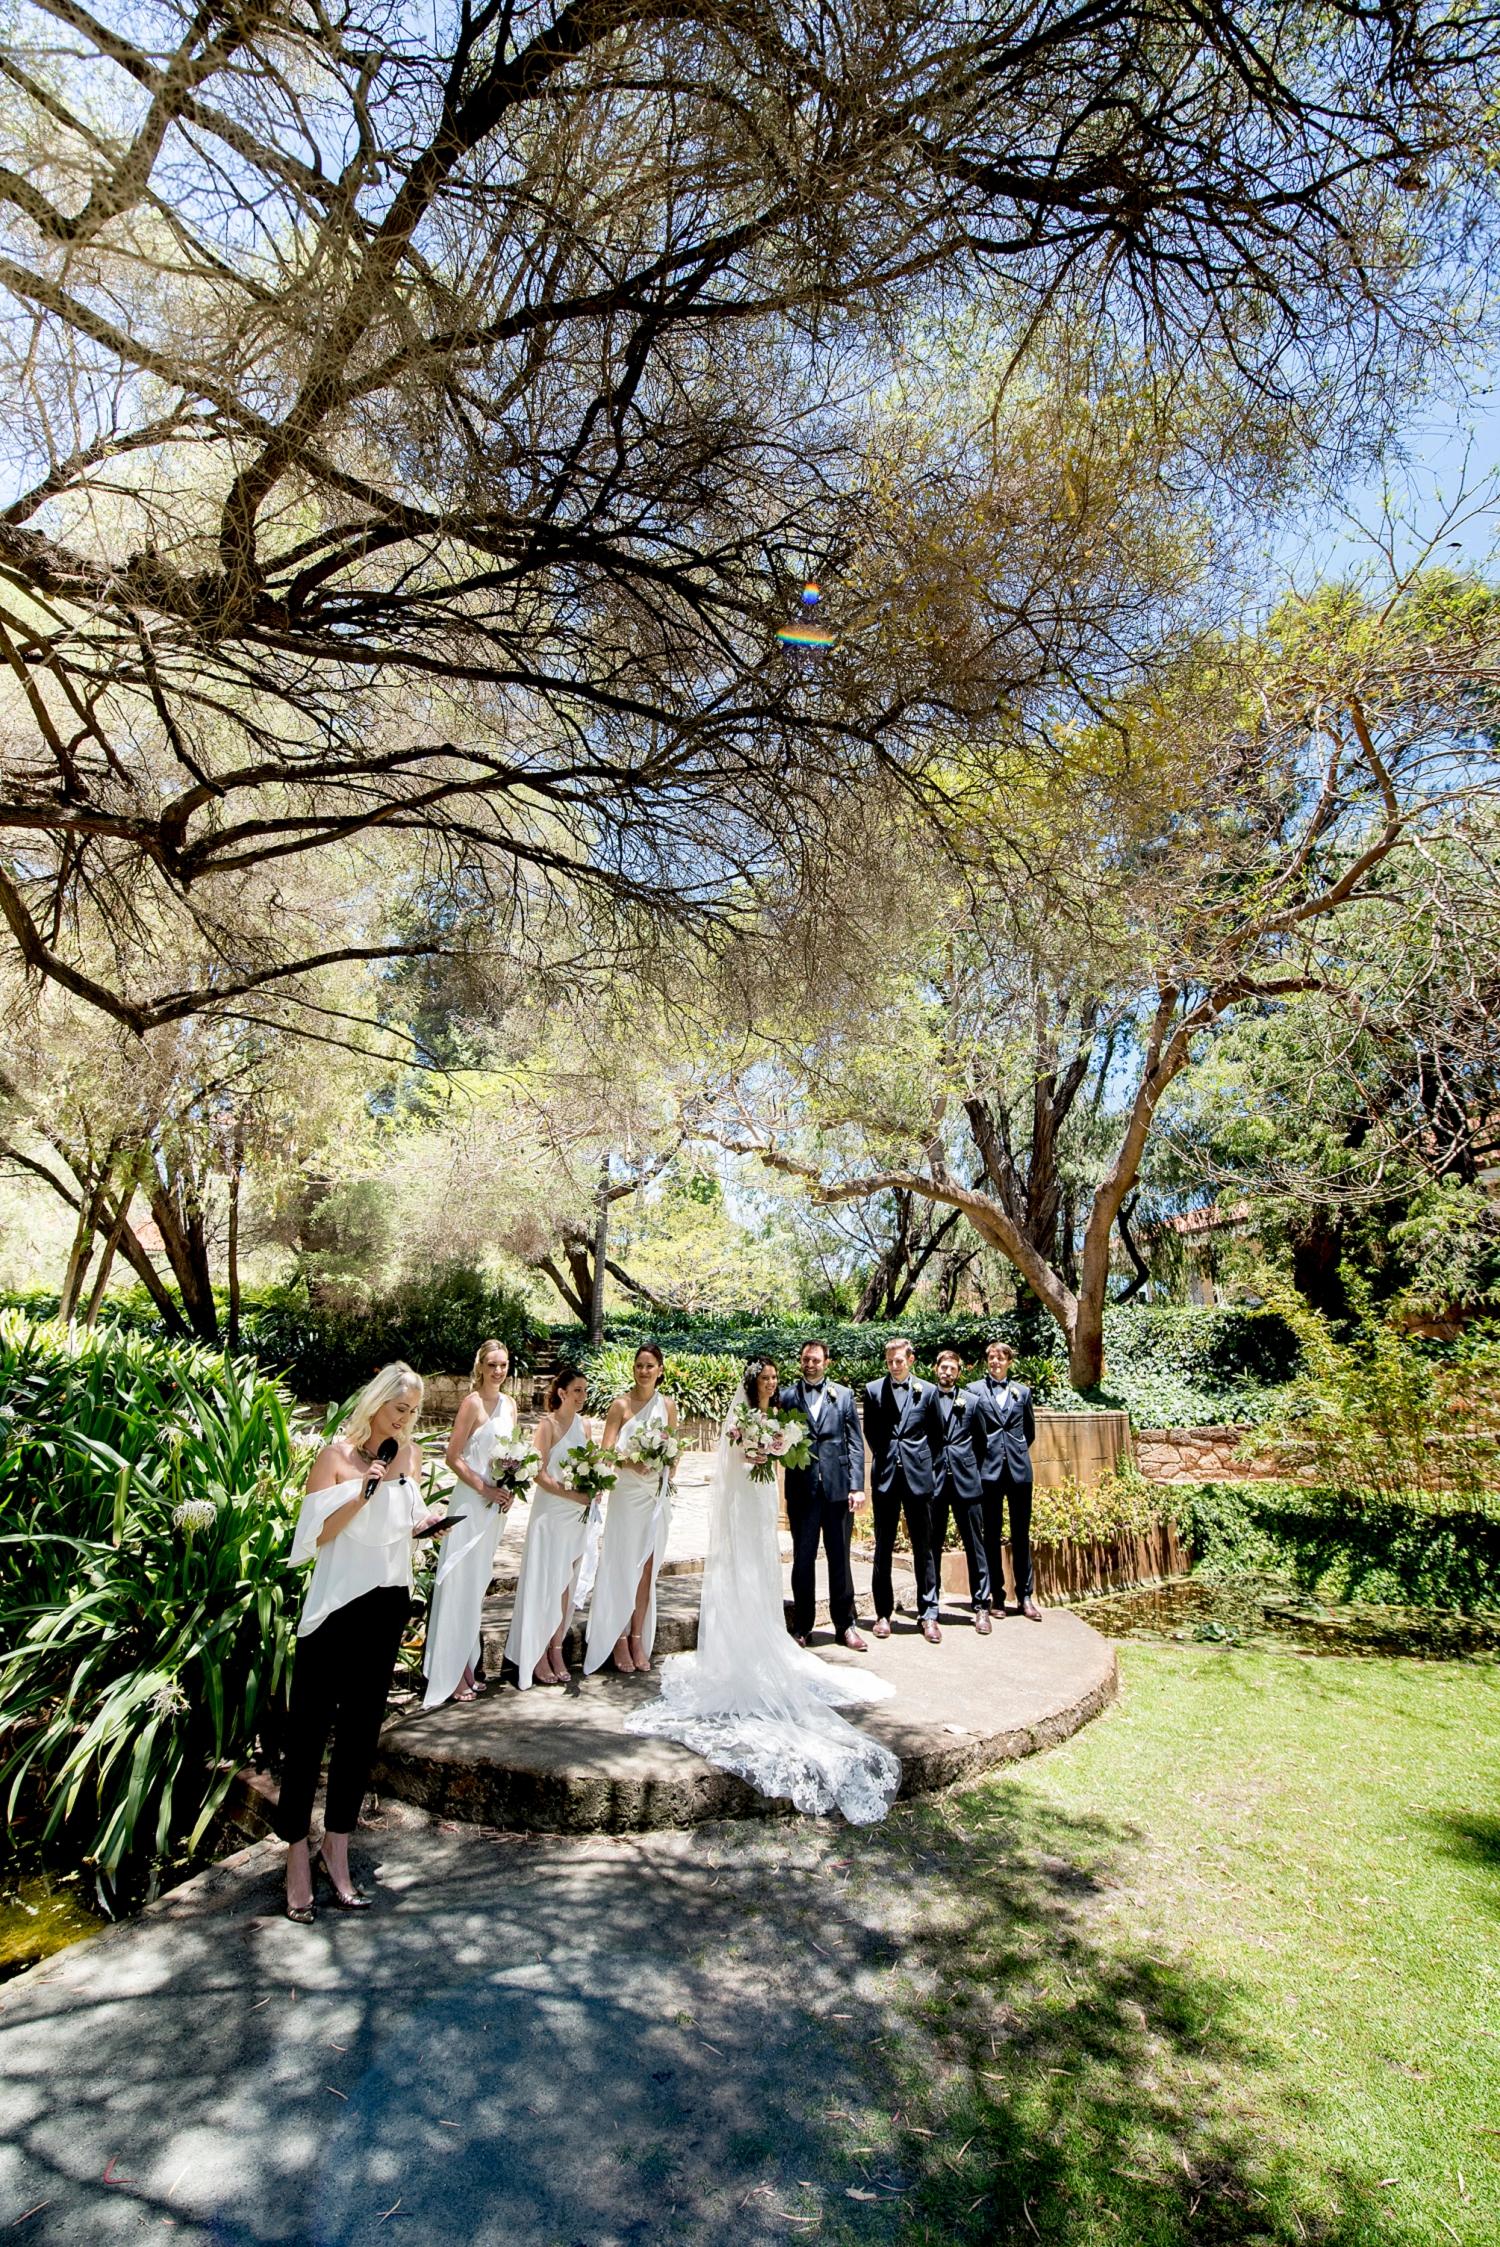 16_uwa sunken gardens wedding perth wedding perth.jpg